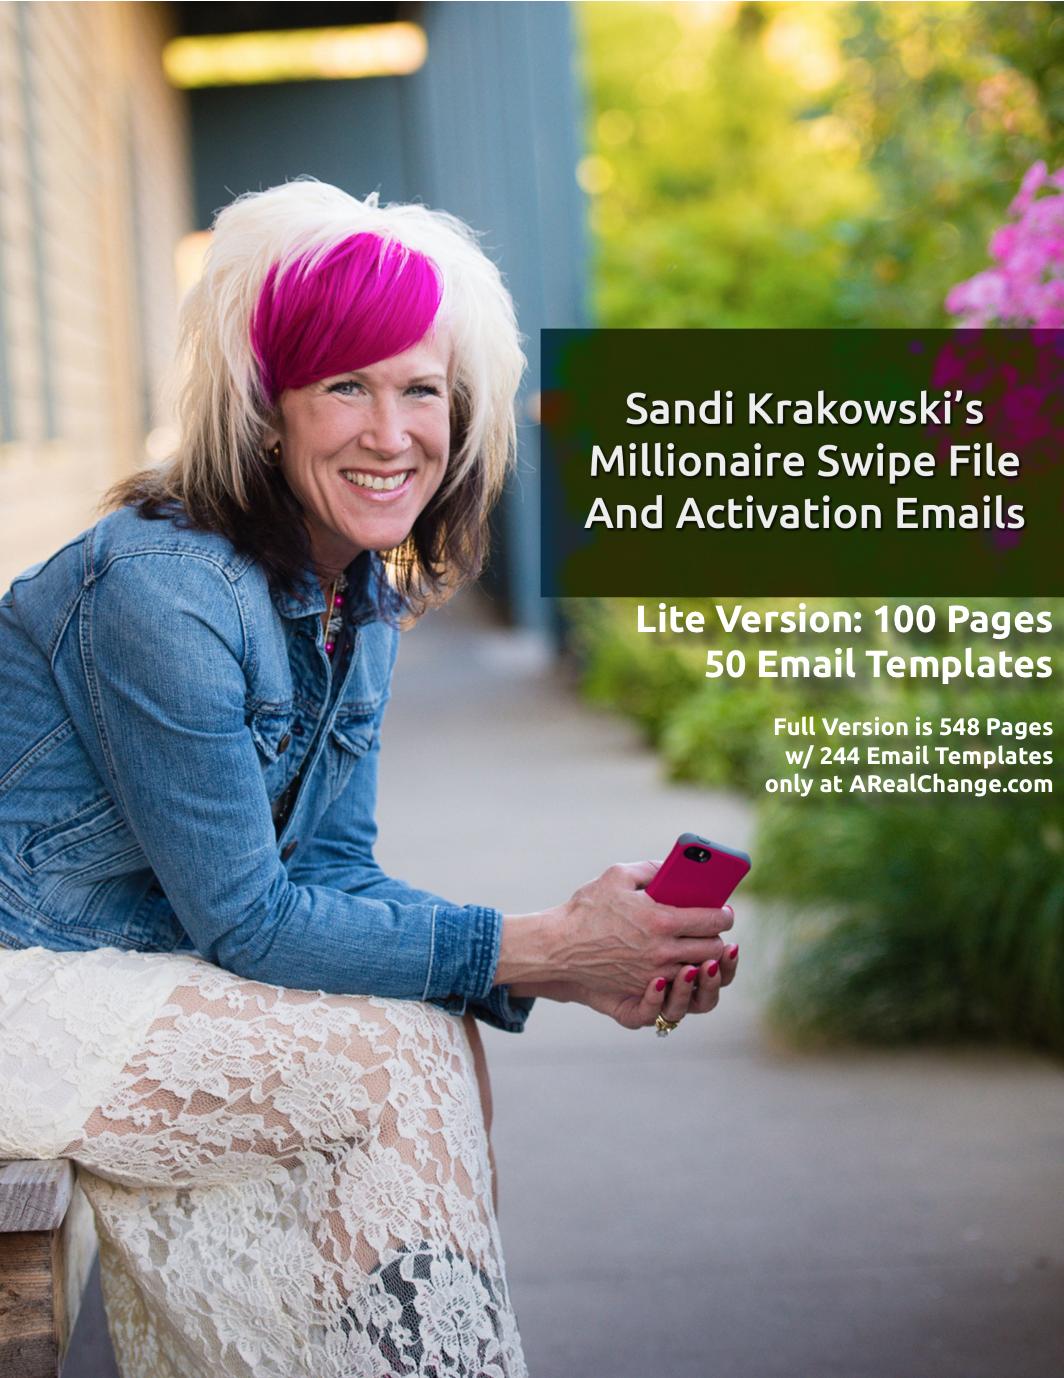 sandi krakwoski swipe file blog